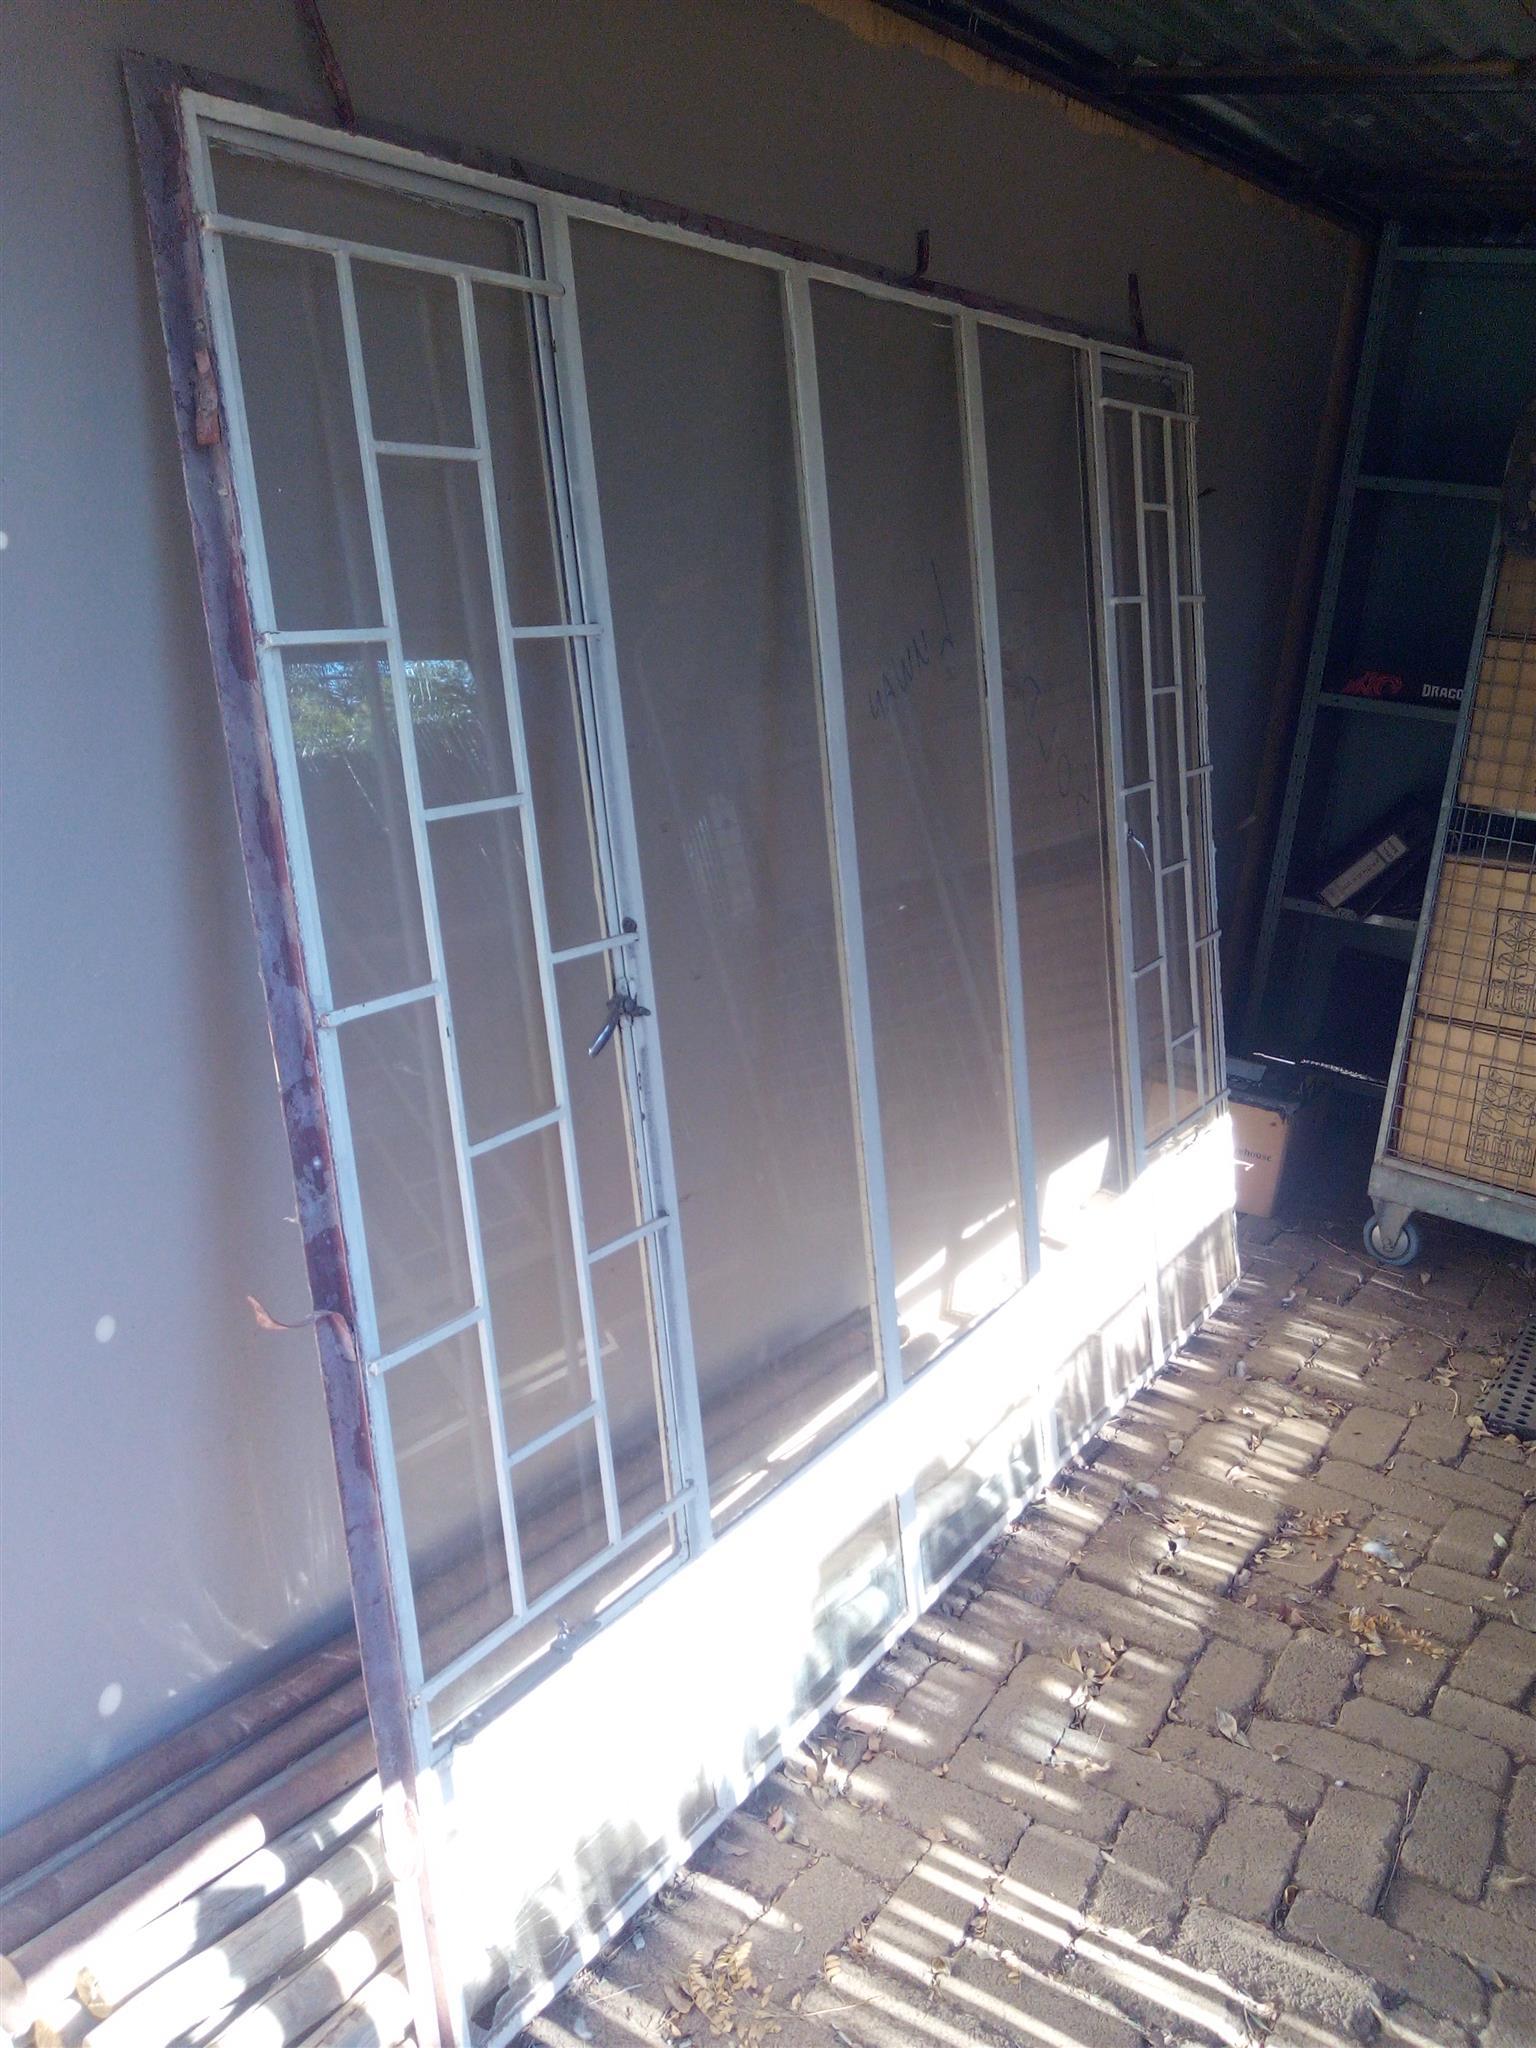 TWO WINDOWS WITH BURGLAR BARS